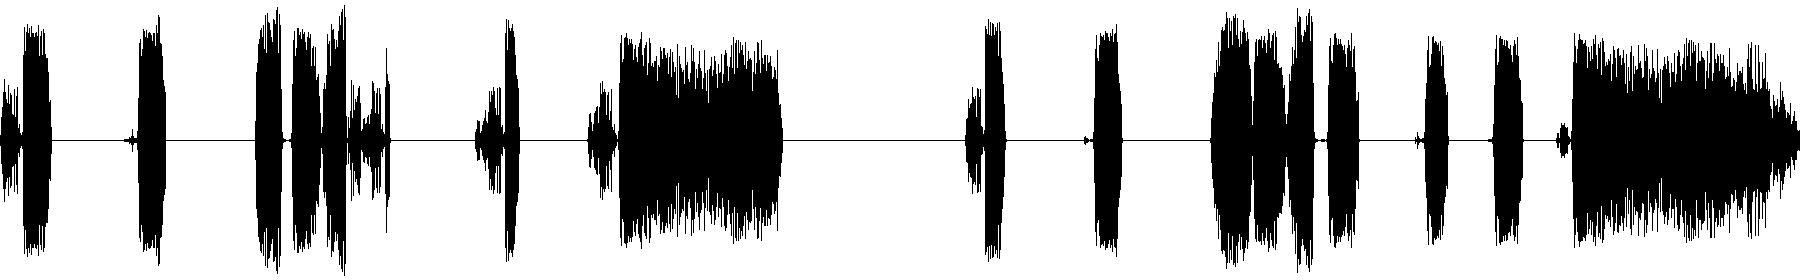 96 scratch loop 06